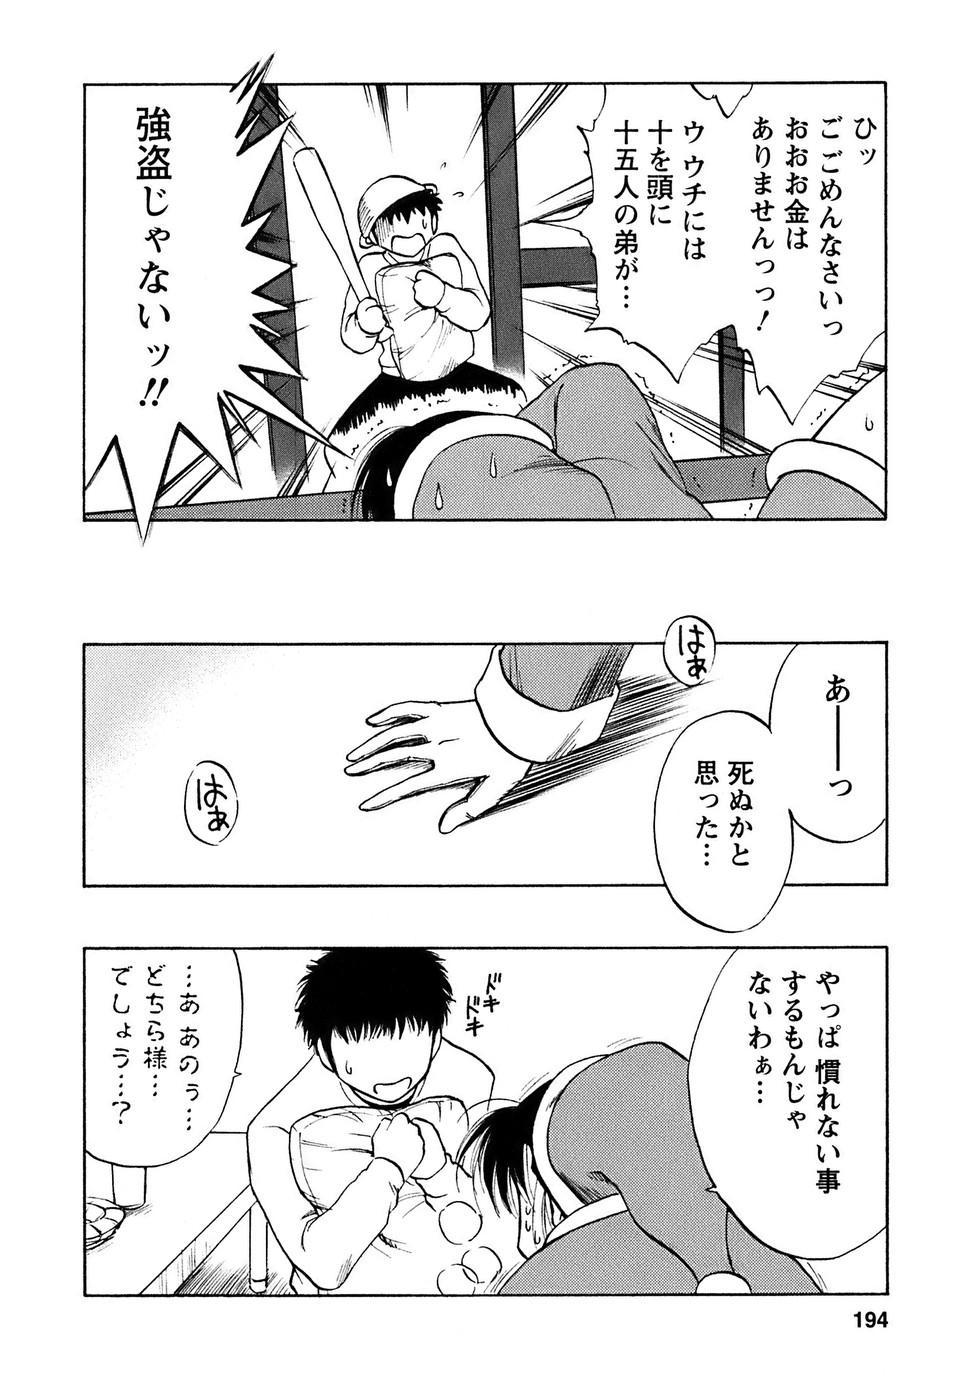 Okusan Volley - Madam Volleyball 194